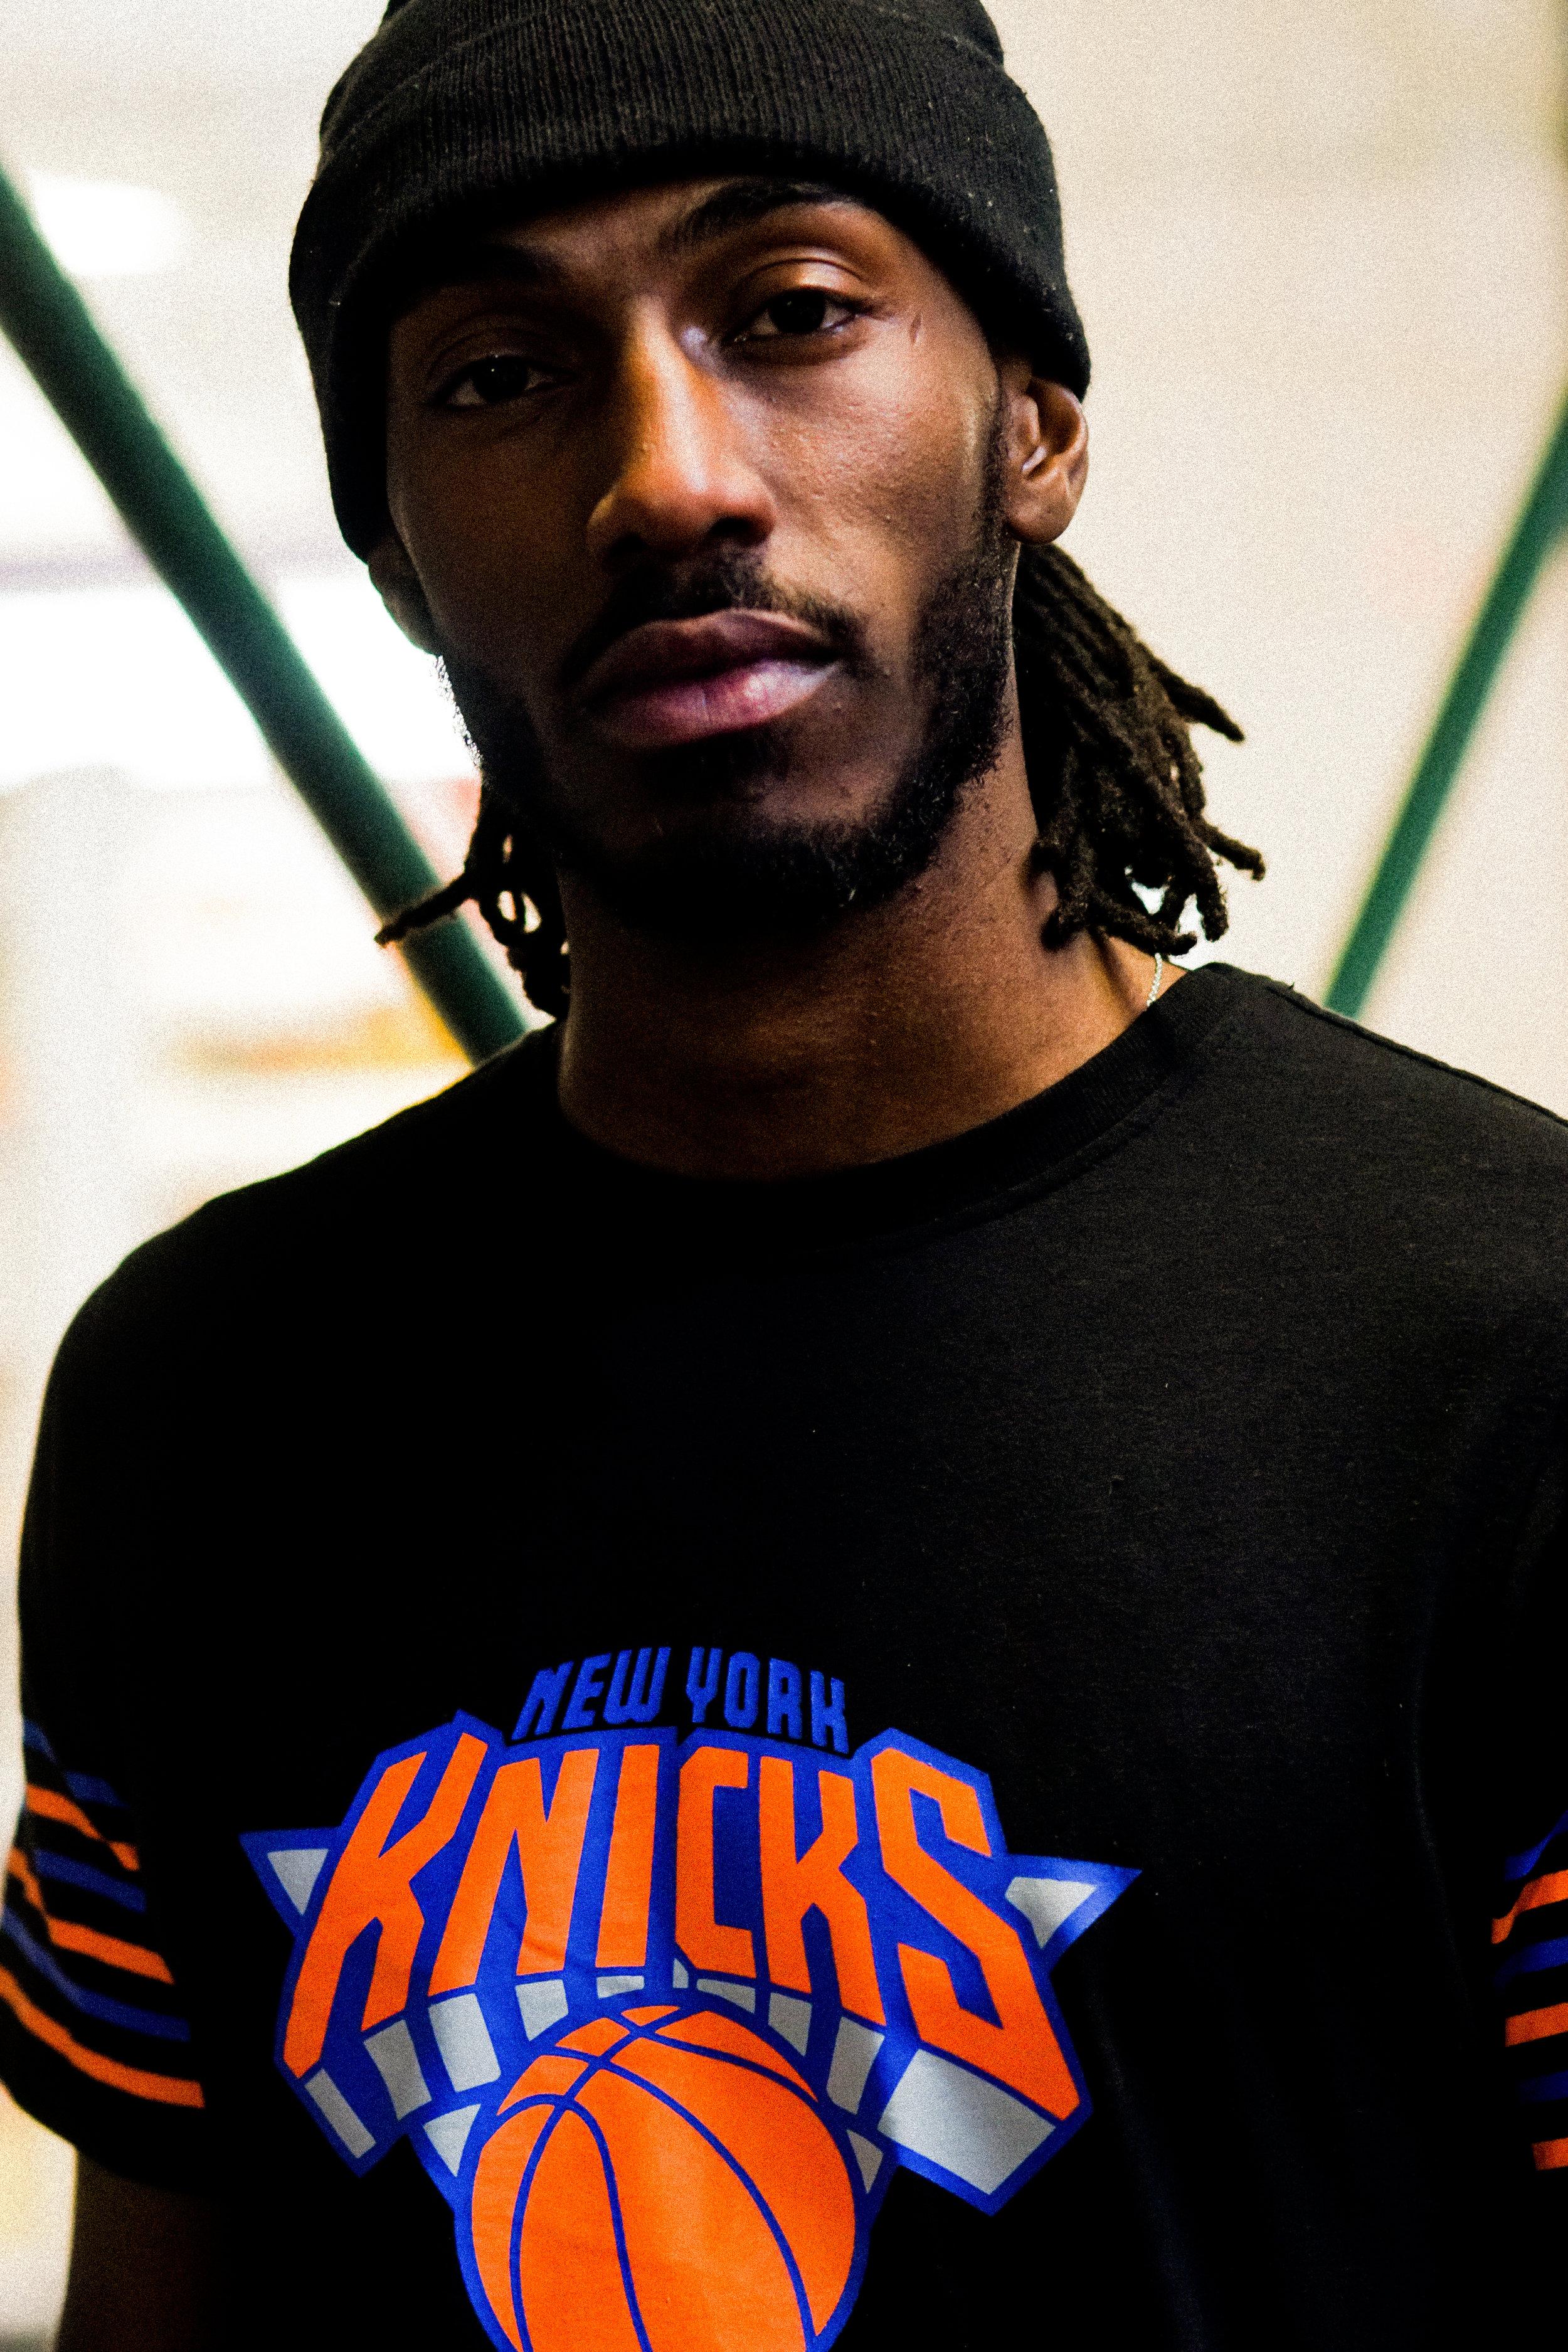 Grungy Gentleman x NY Knicks 4.jpg